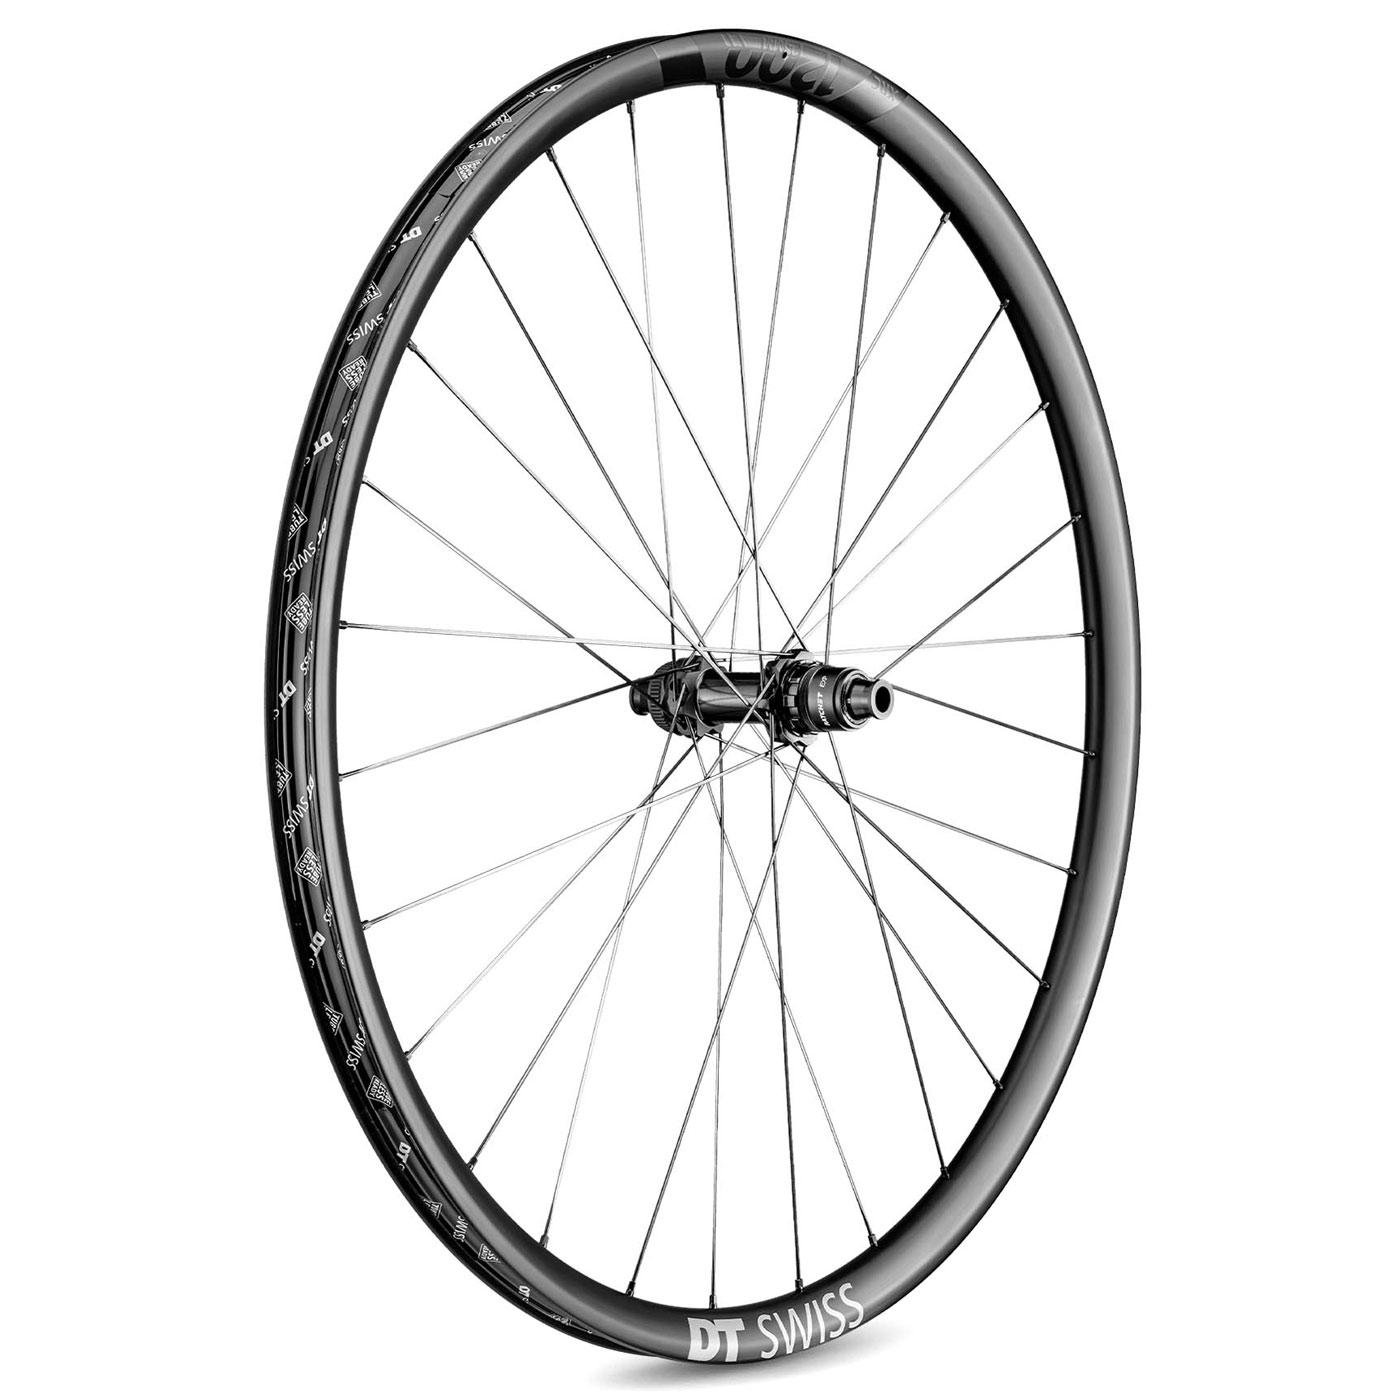 "DT Swiss XRC 1200 SPLINE 25 - Carbon - 29"" Rear Wheel - Clincher - Centerlock / 6-Bolt - Shimano Micro Spline / SRAM XD - 12x148mm Boost"